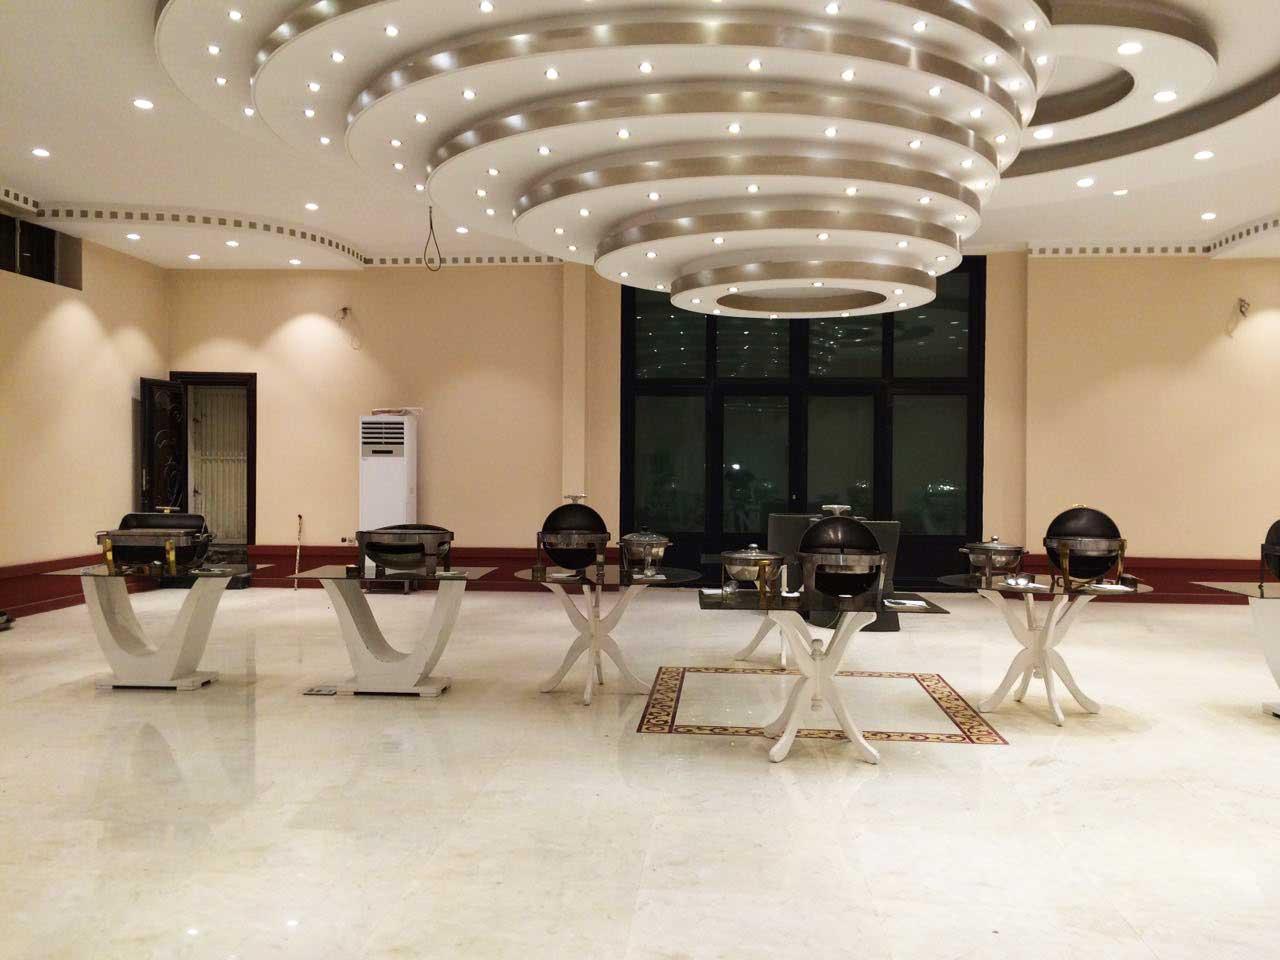 سالن اجتماعات 1